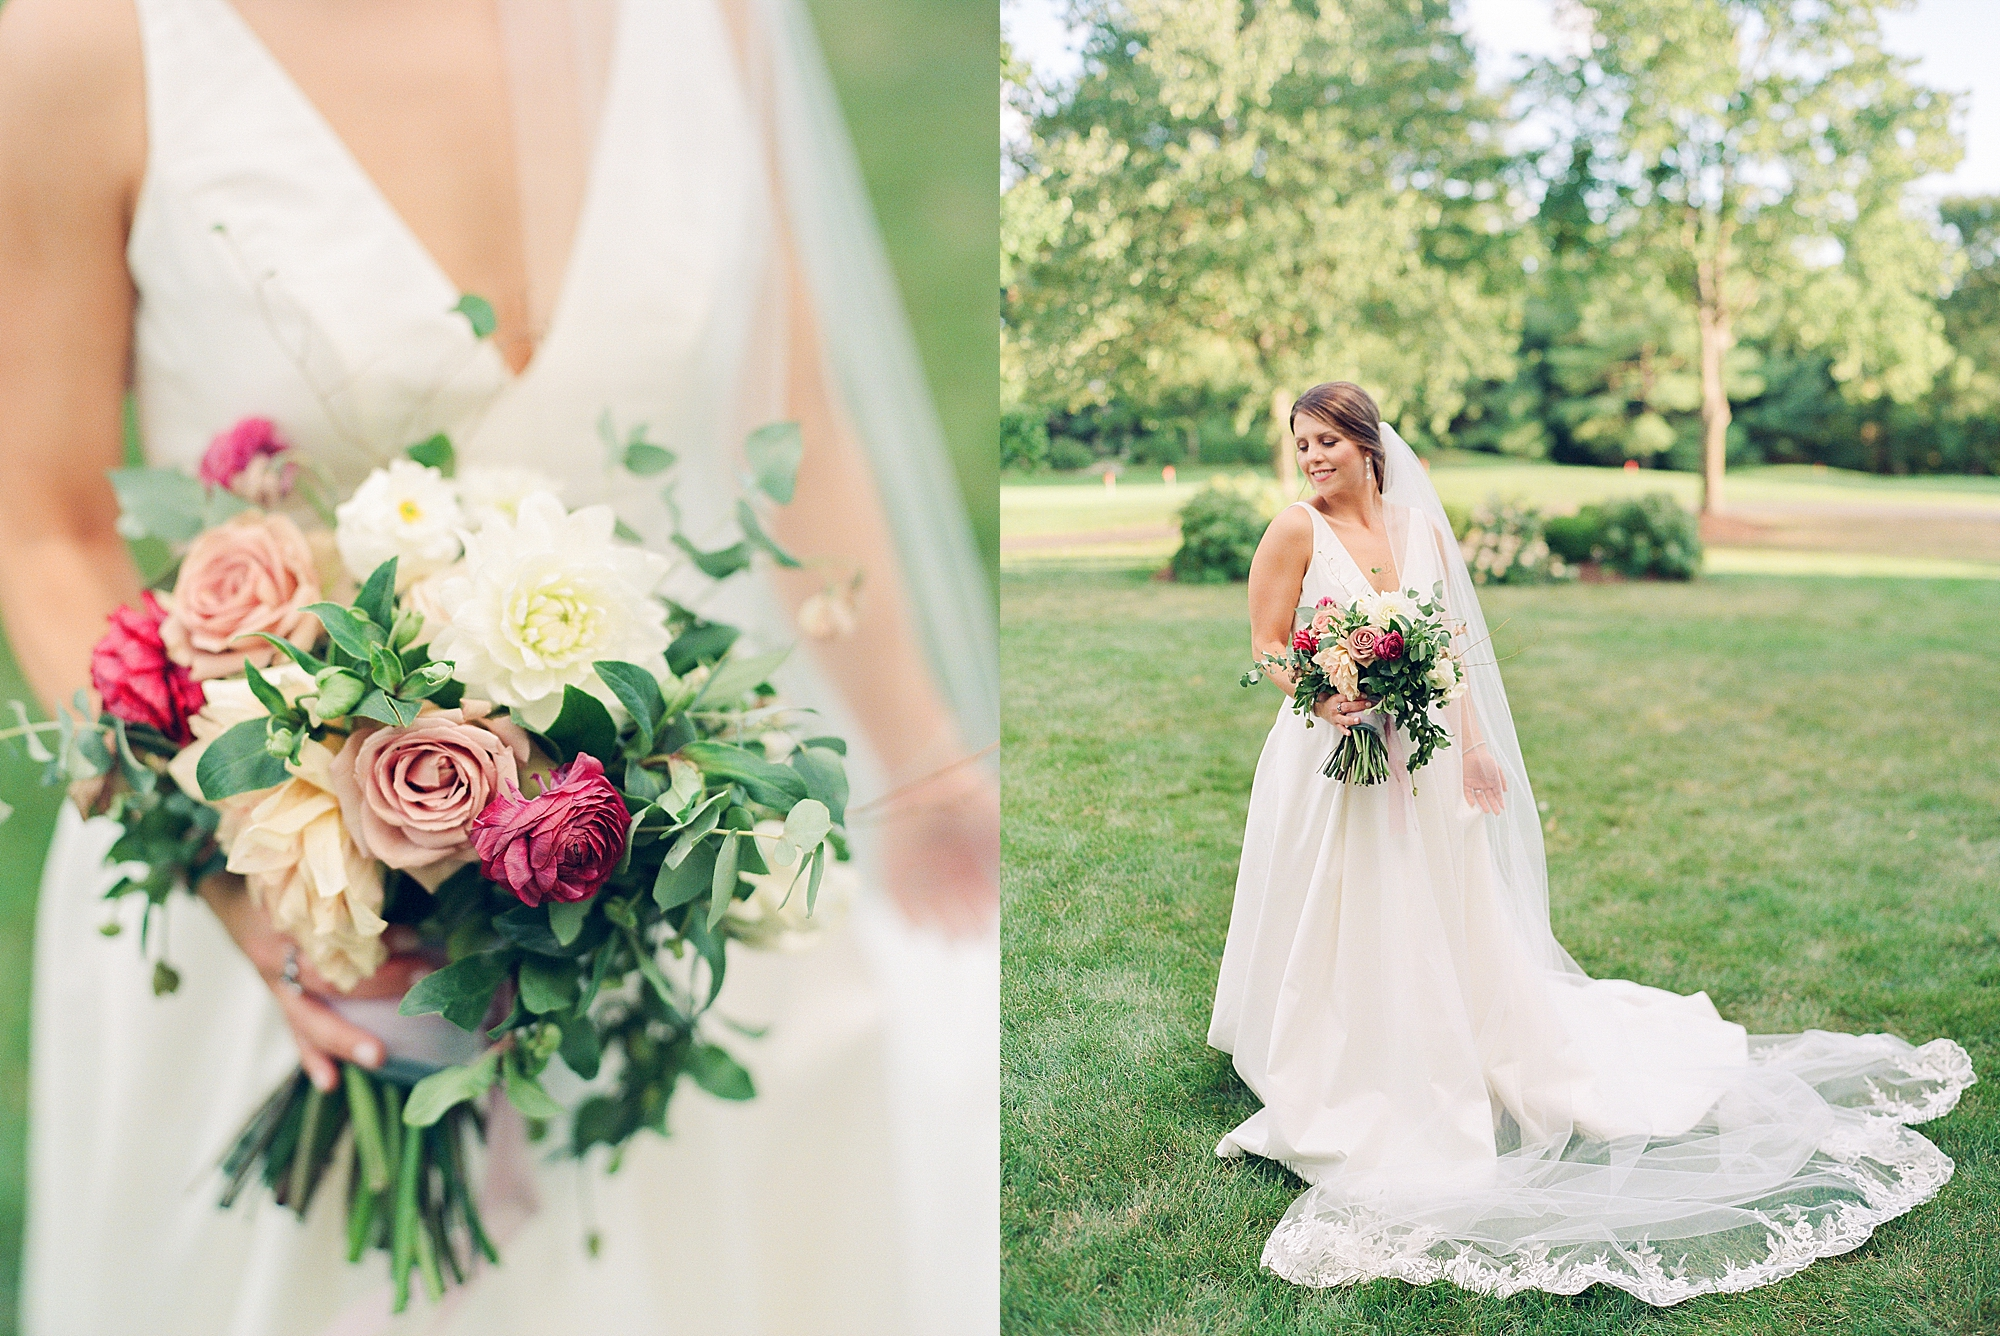 Princeton New Jersey Film Wedding Photographer Princeton University Wedding Photography by Magdalena Studios NJ Wedding Photographer47